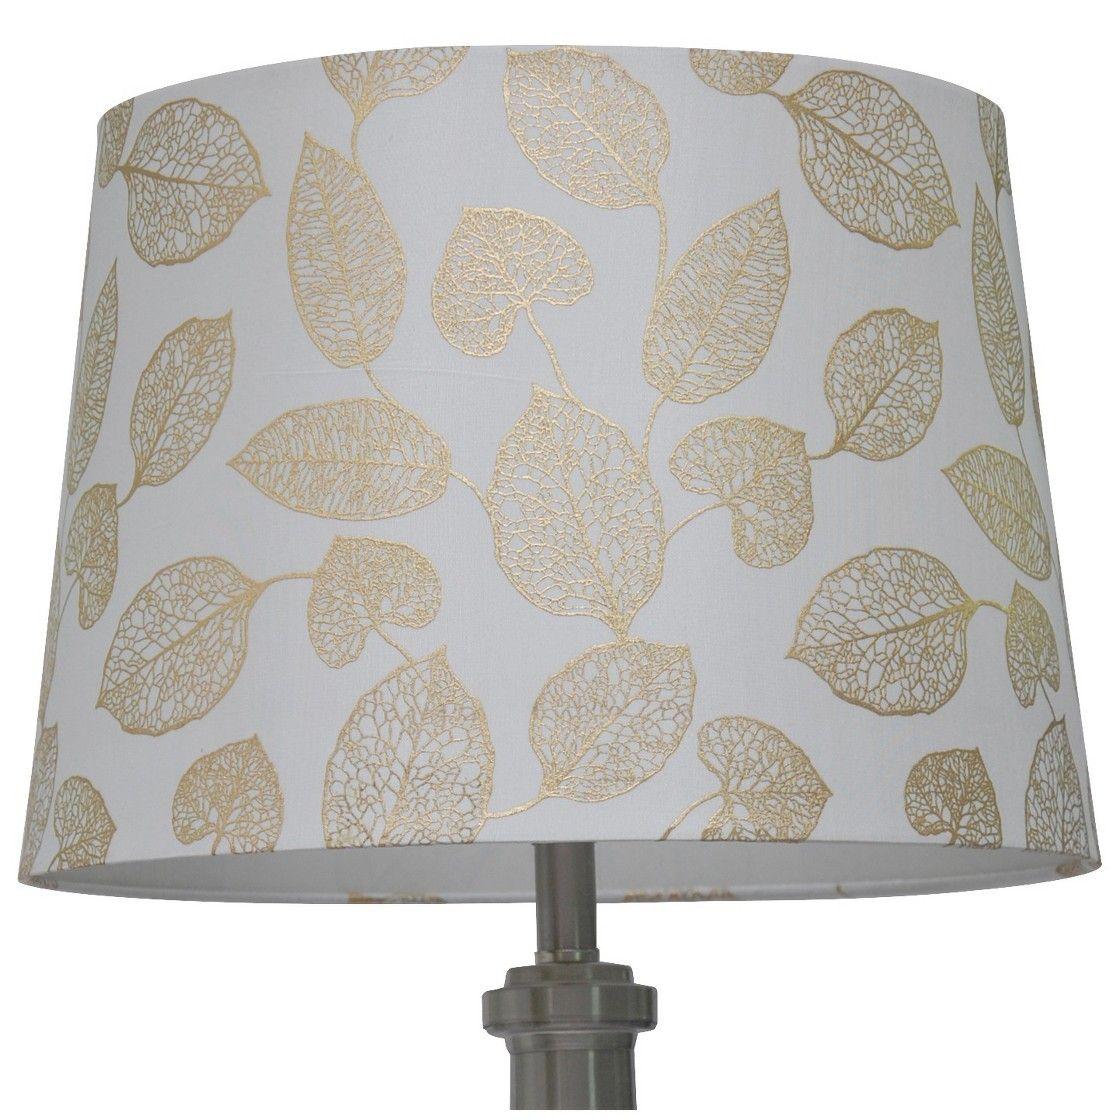 Threshold Metallic Foil Leaf Lamp Shade Gold